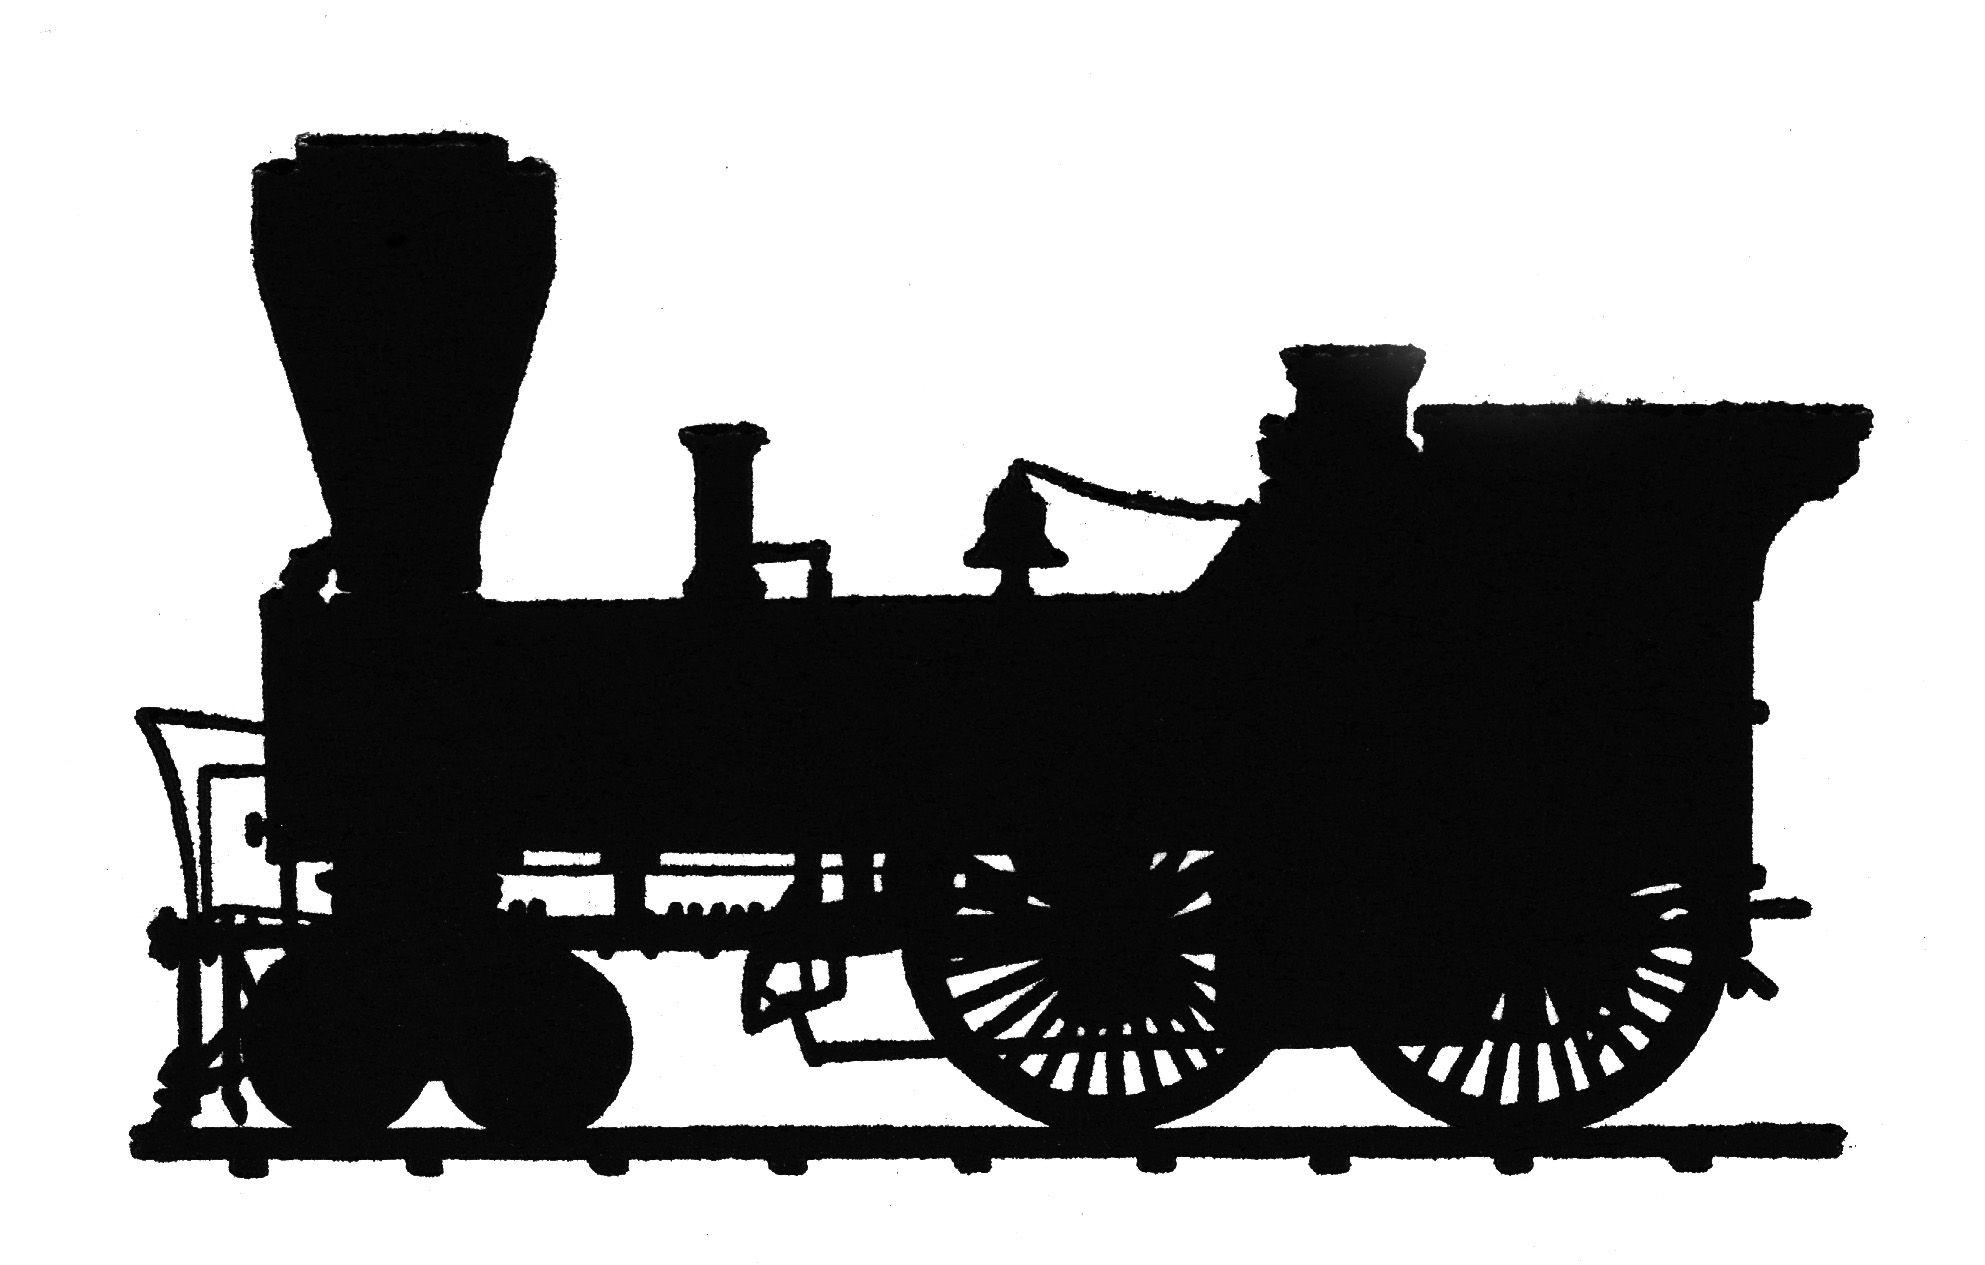 Http Clipart Library Com Clipart Clipart 1143811 Htm Train Silhouette Vintage Train Silhouette Png